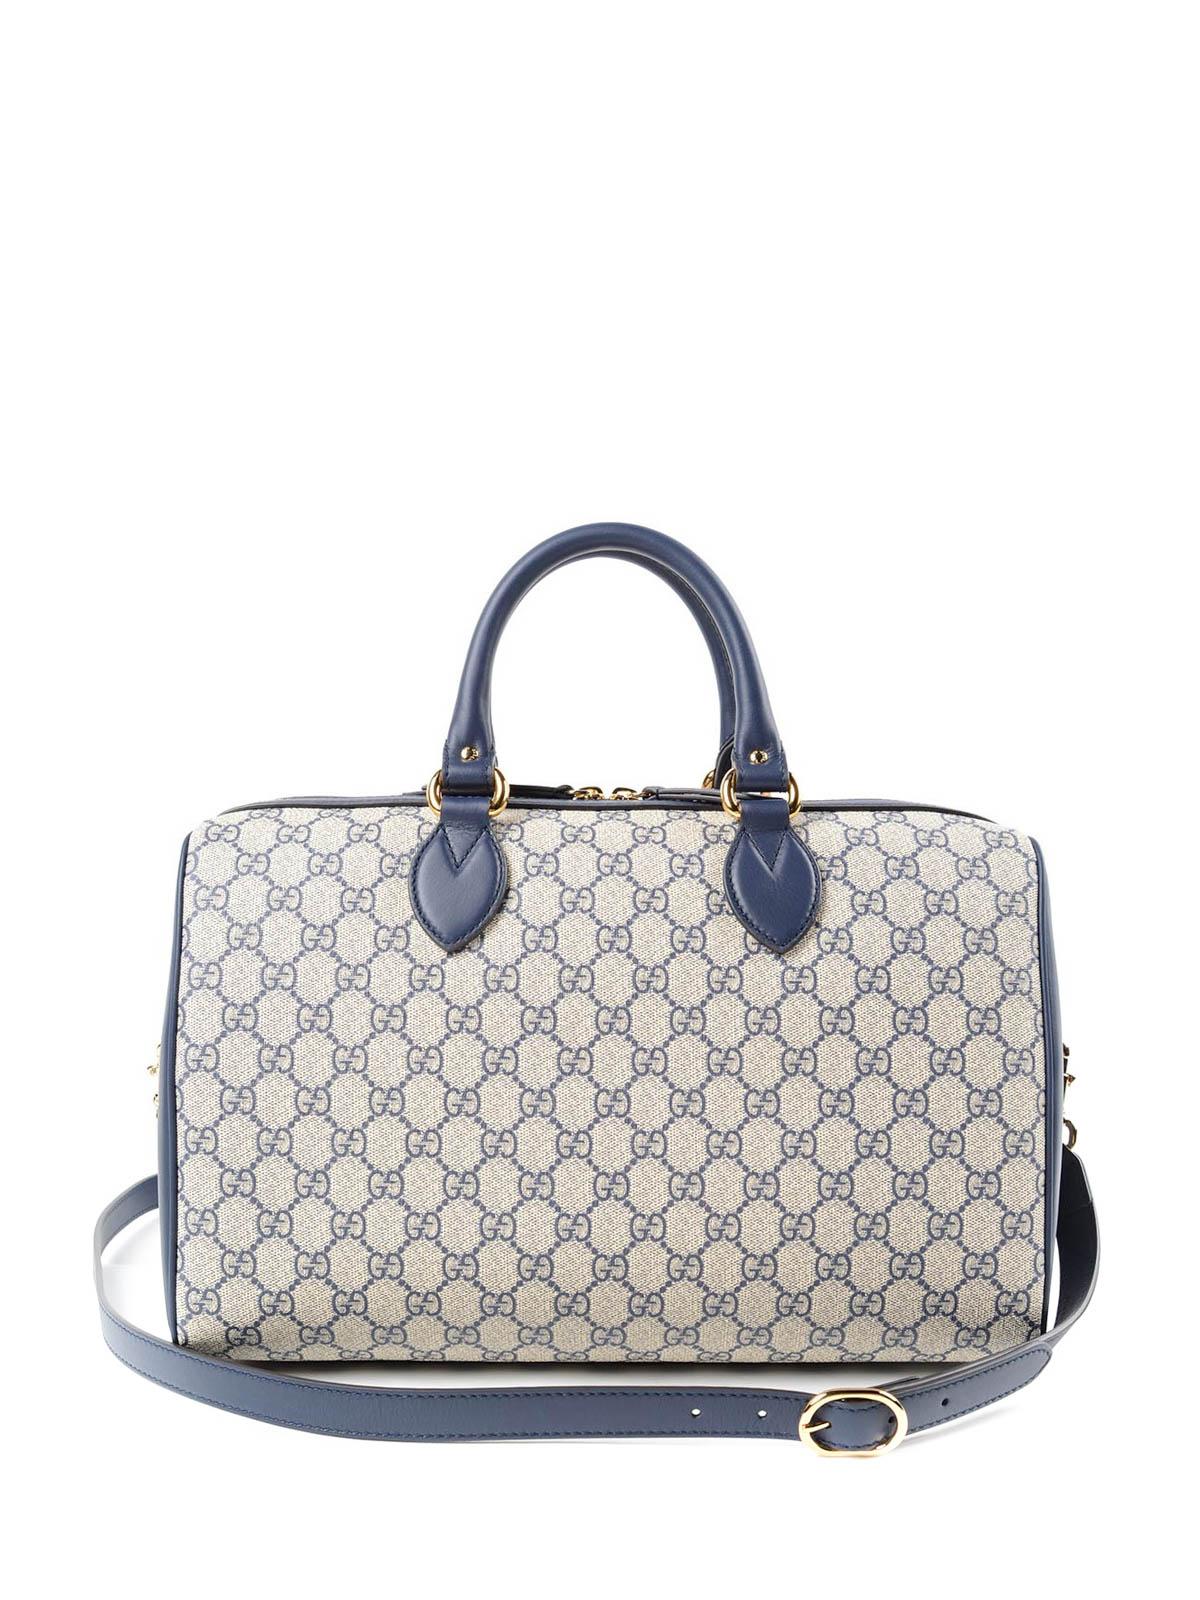 GG Supreme Fabric Bowling Bag By Gucci - Bowling Bags | IKRIX